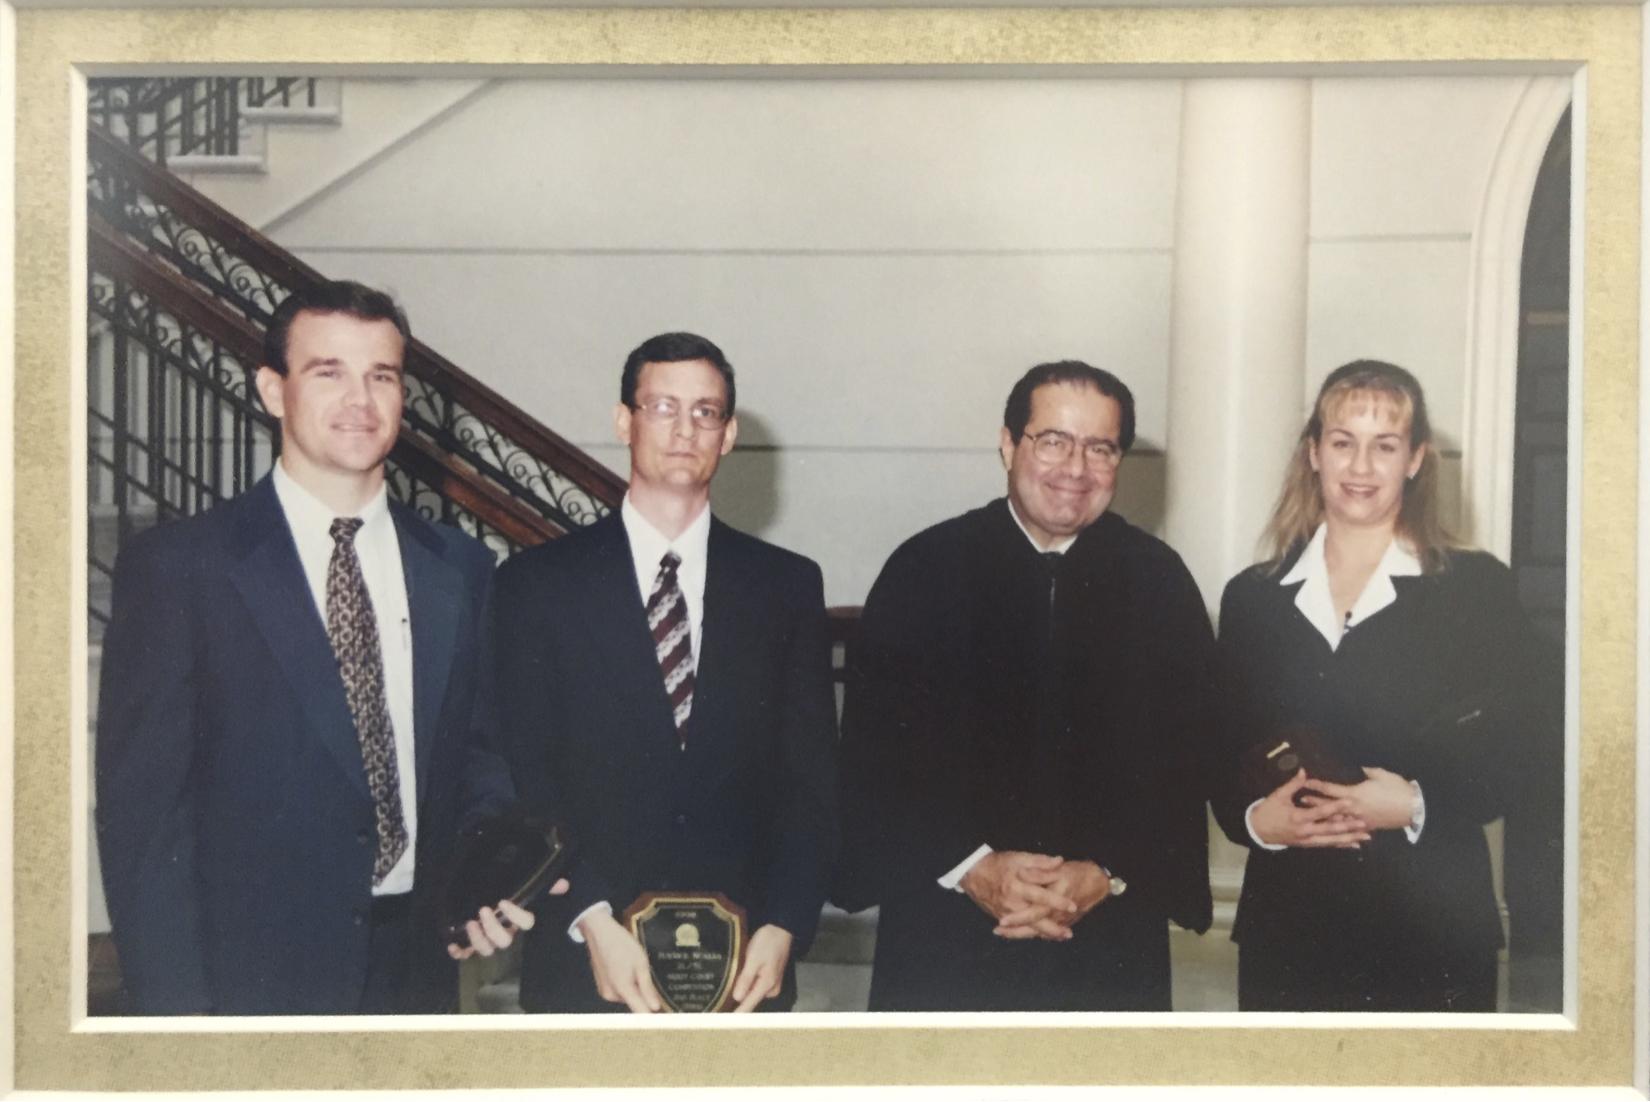 Scalia photo